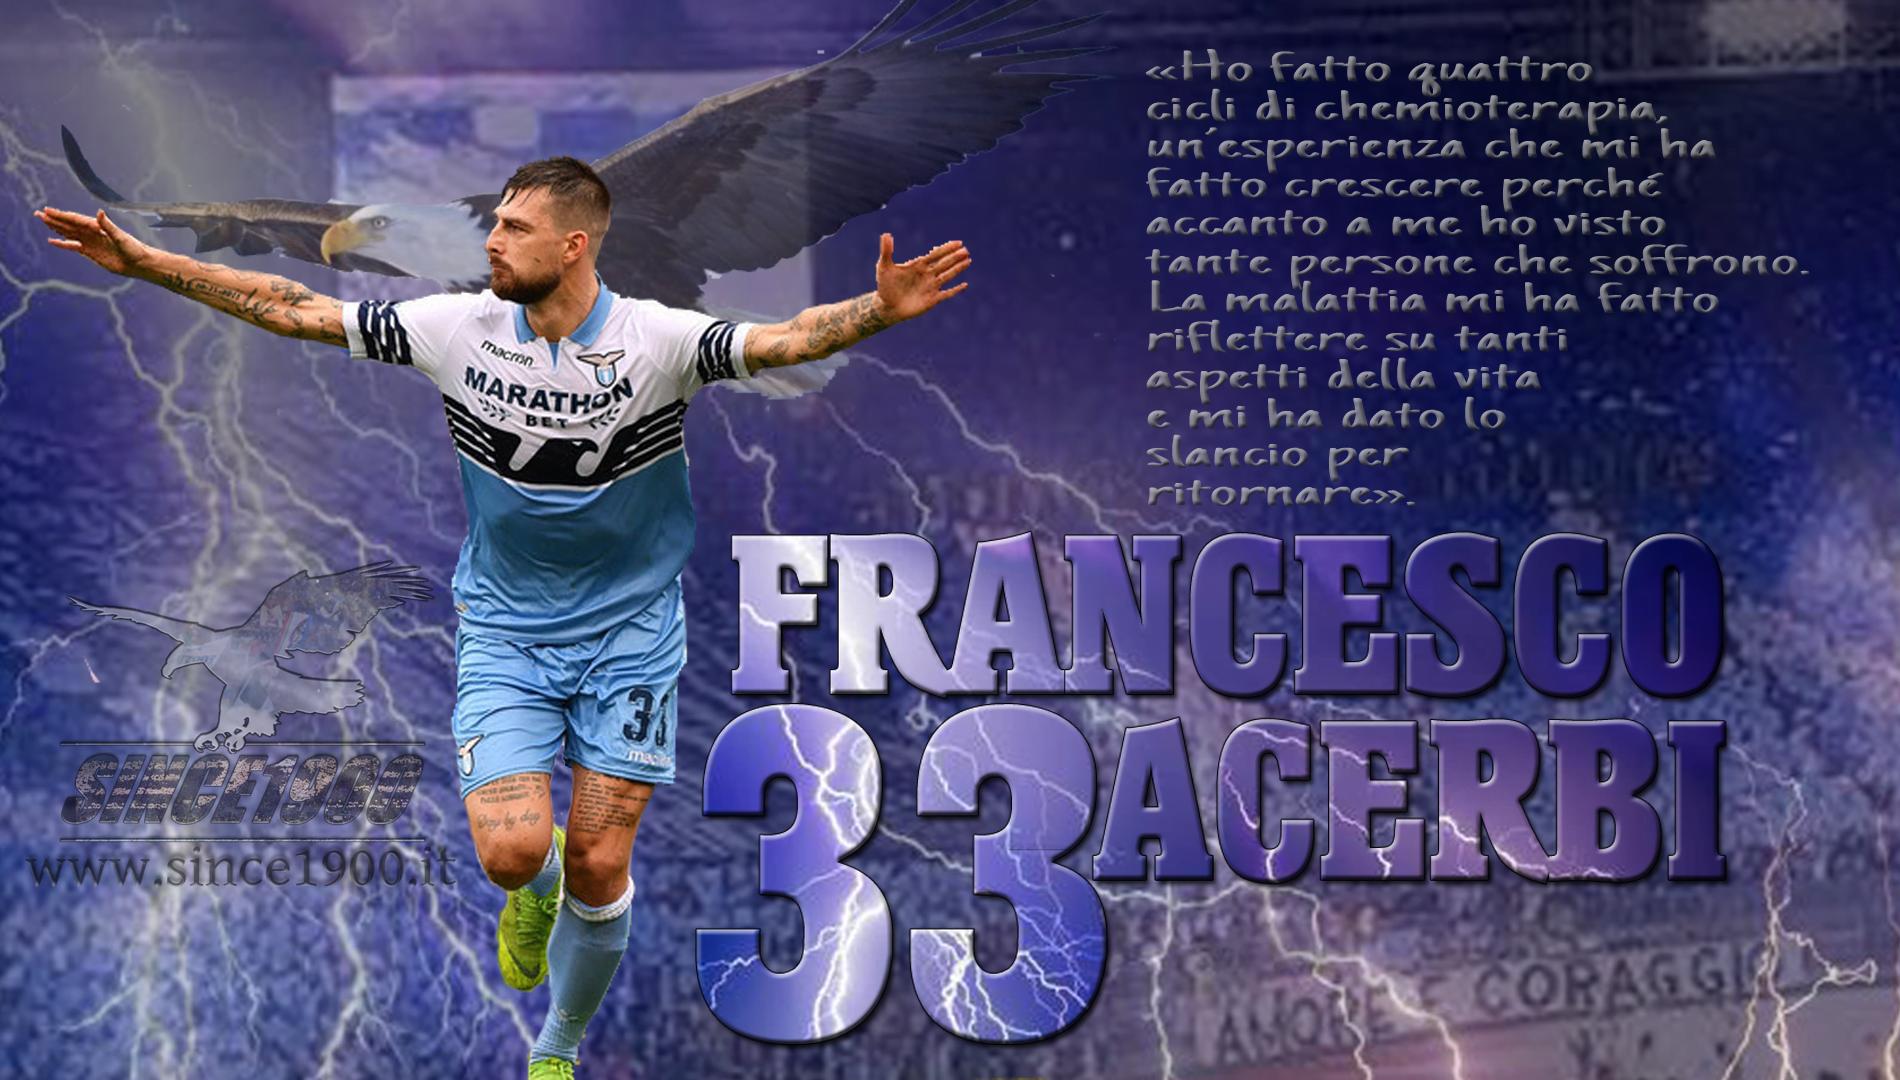 Francesco Acerbi ripercorre la sua storia a Sky: Dalla malattia ...